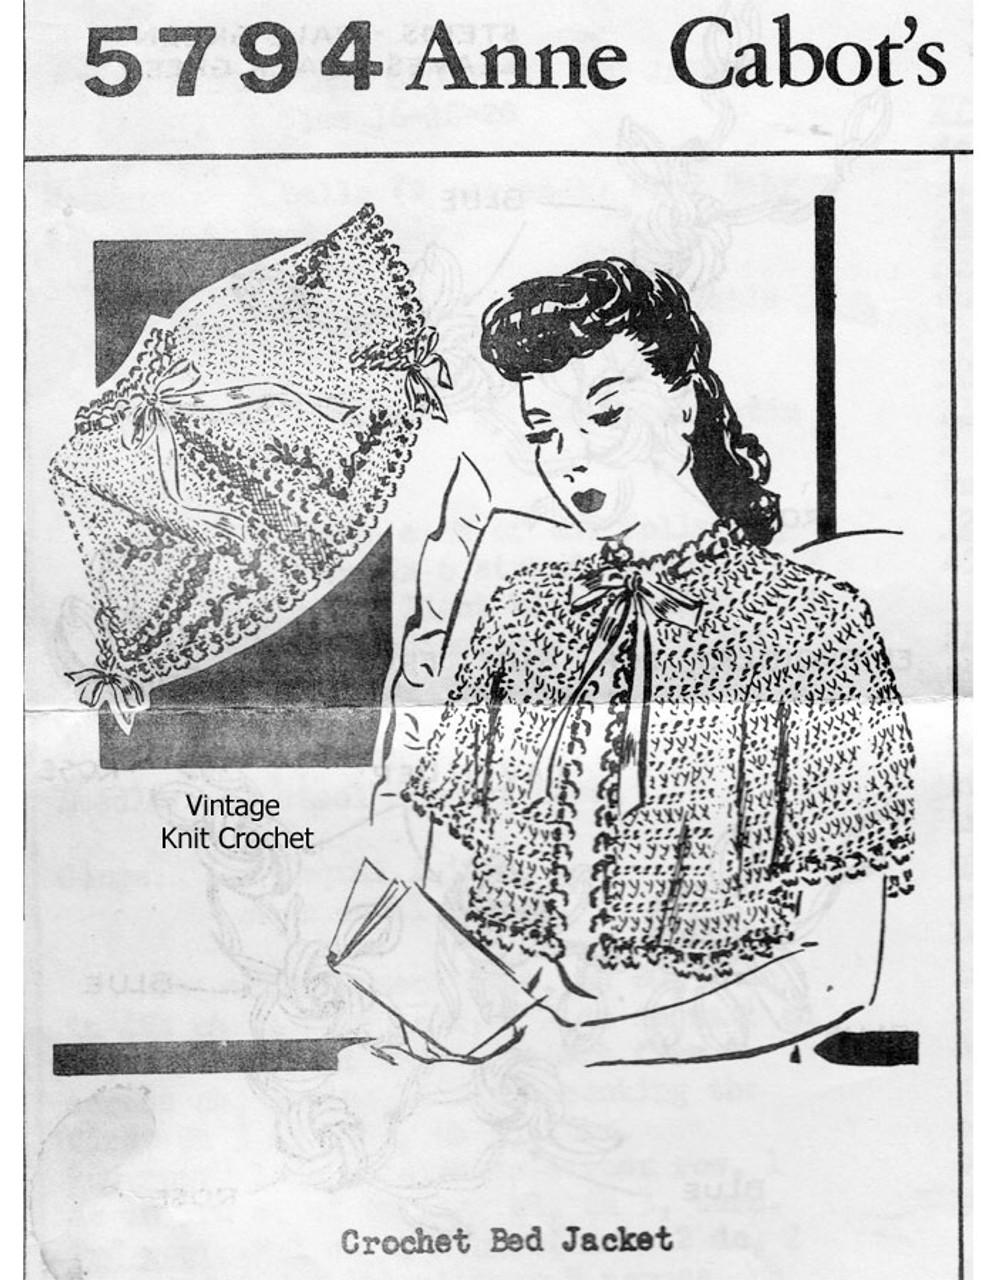 Vintage Crochet Lace Bed Jacket Pattern, Anne Cabot 5794